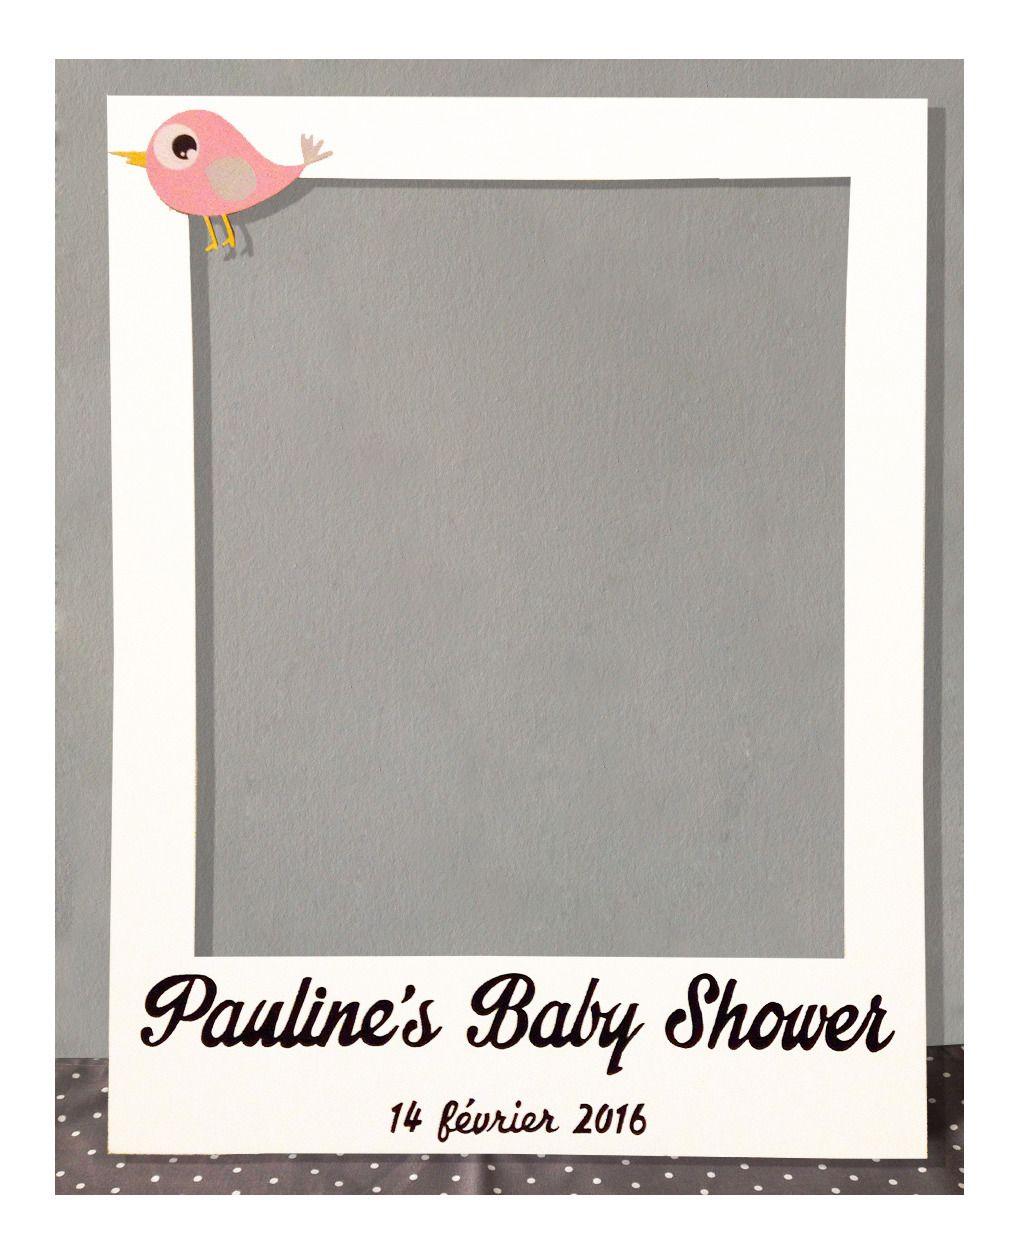 cadre photobooth babyshower party 39 s pinterest papeterie cadres et le monde entier. Black Bedroom Furniture Sets. Home Design Ideas